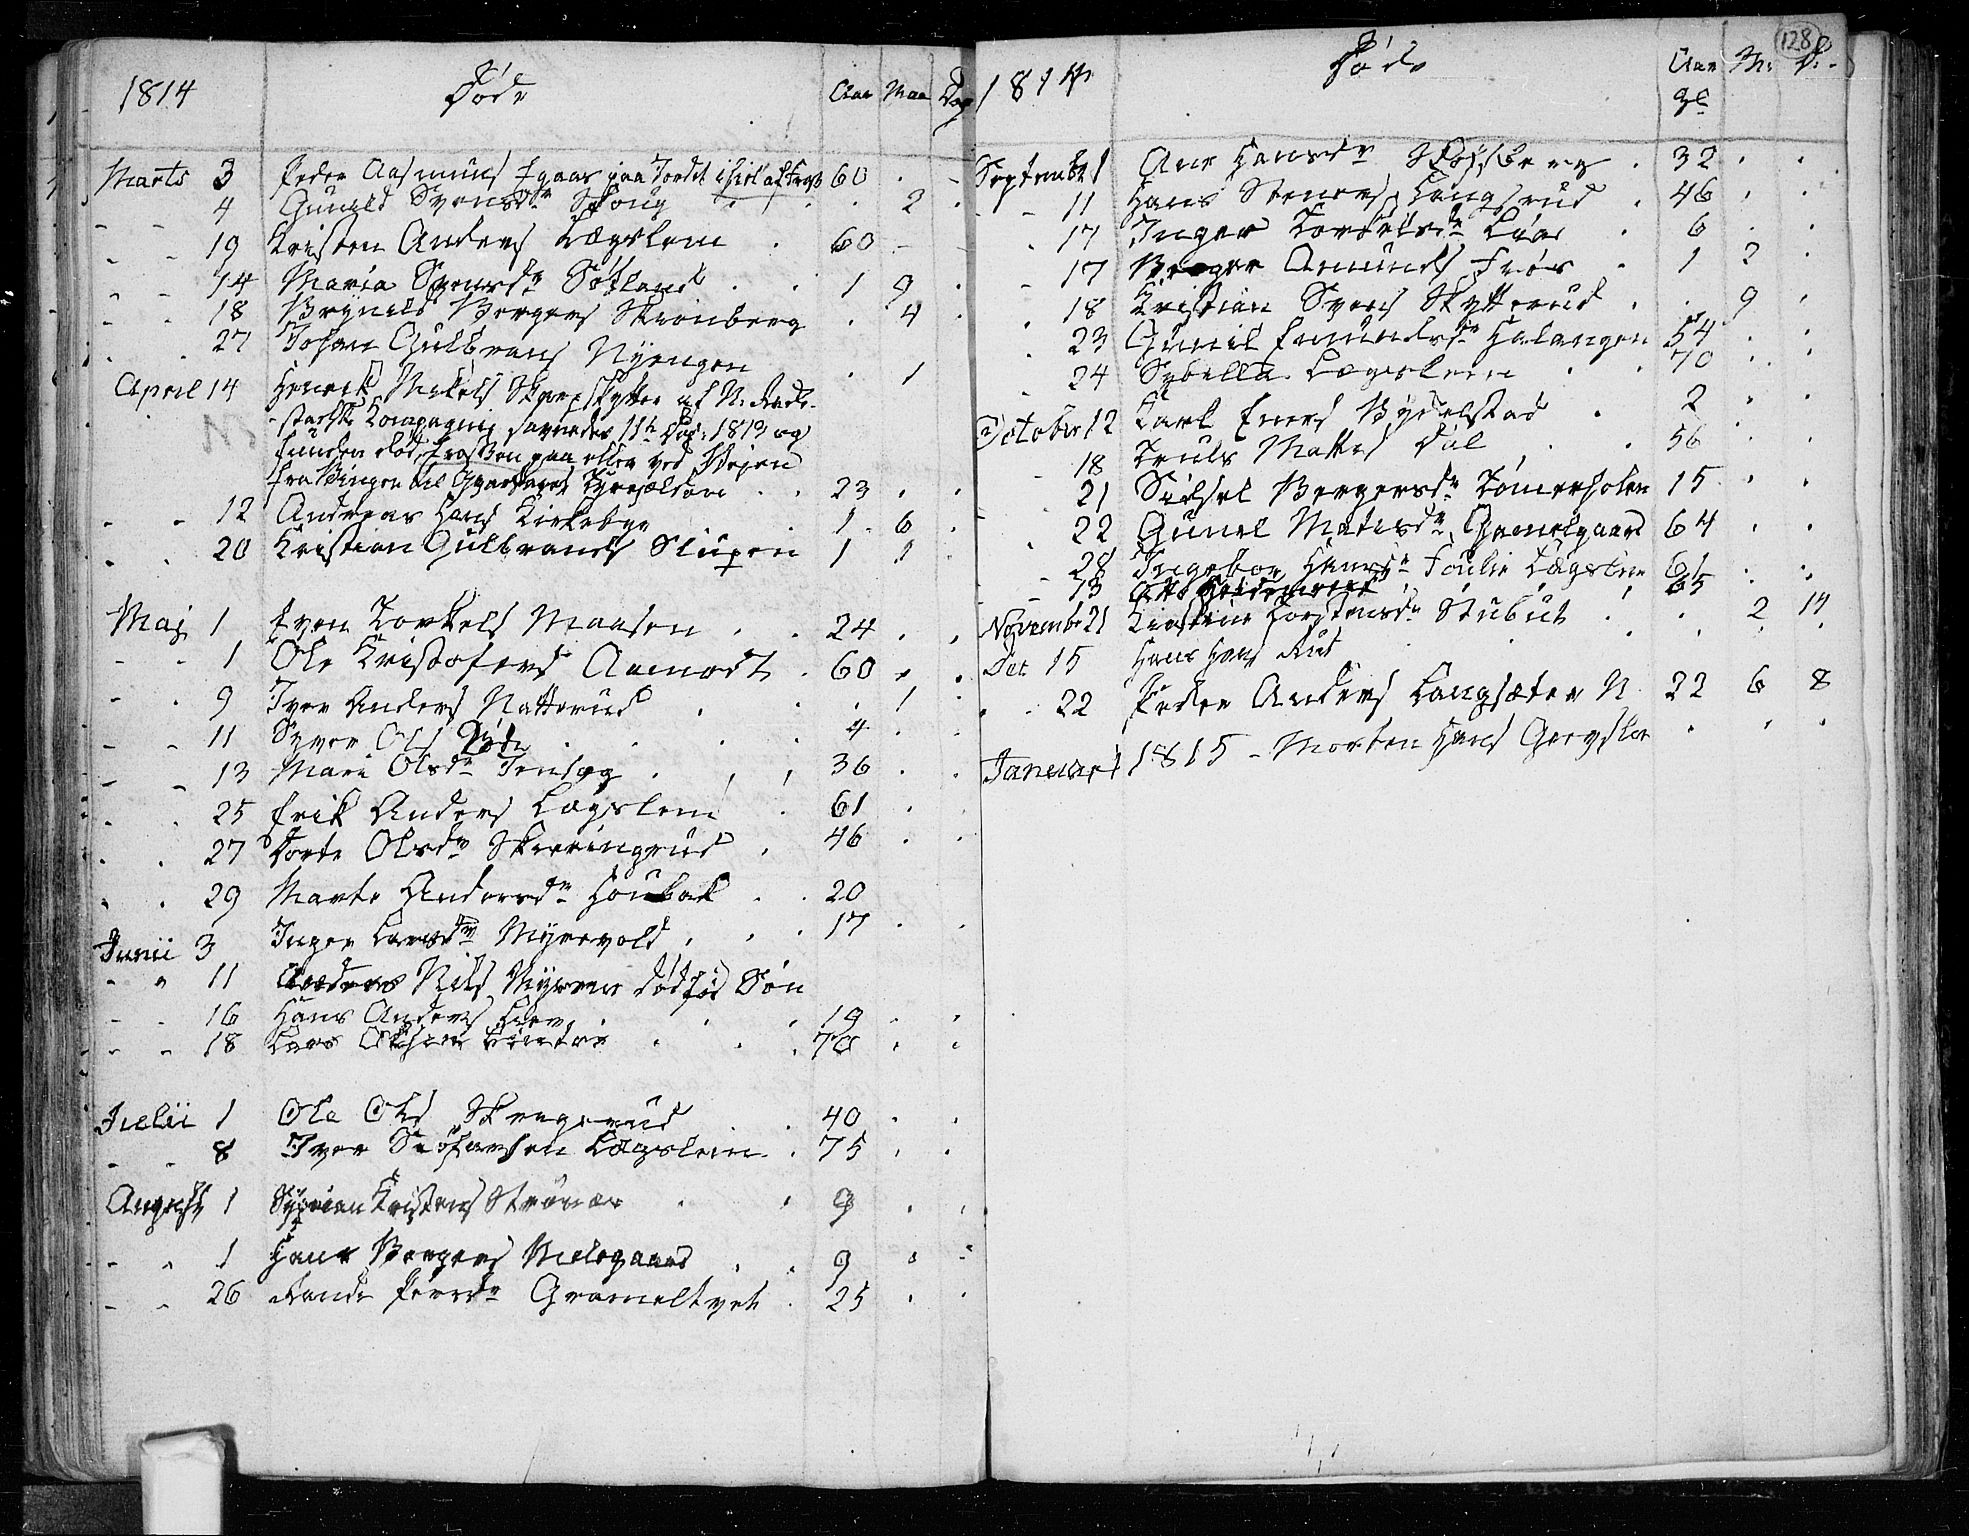 SAO, Trøgstad prestekontor Kirkebøker, F/Fa/L0005: Ministerialbok nr. I 5, 1784-1814, s. 128